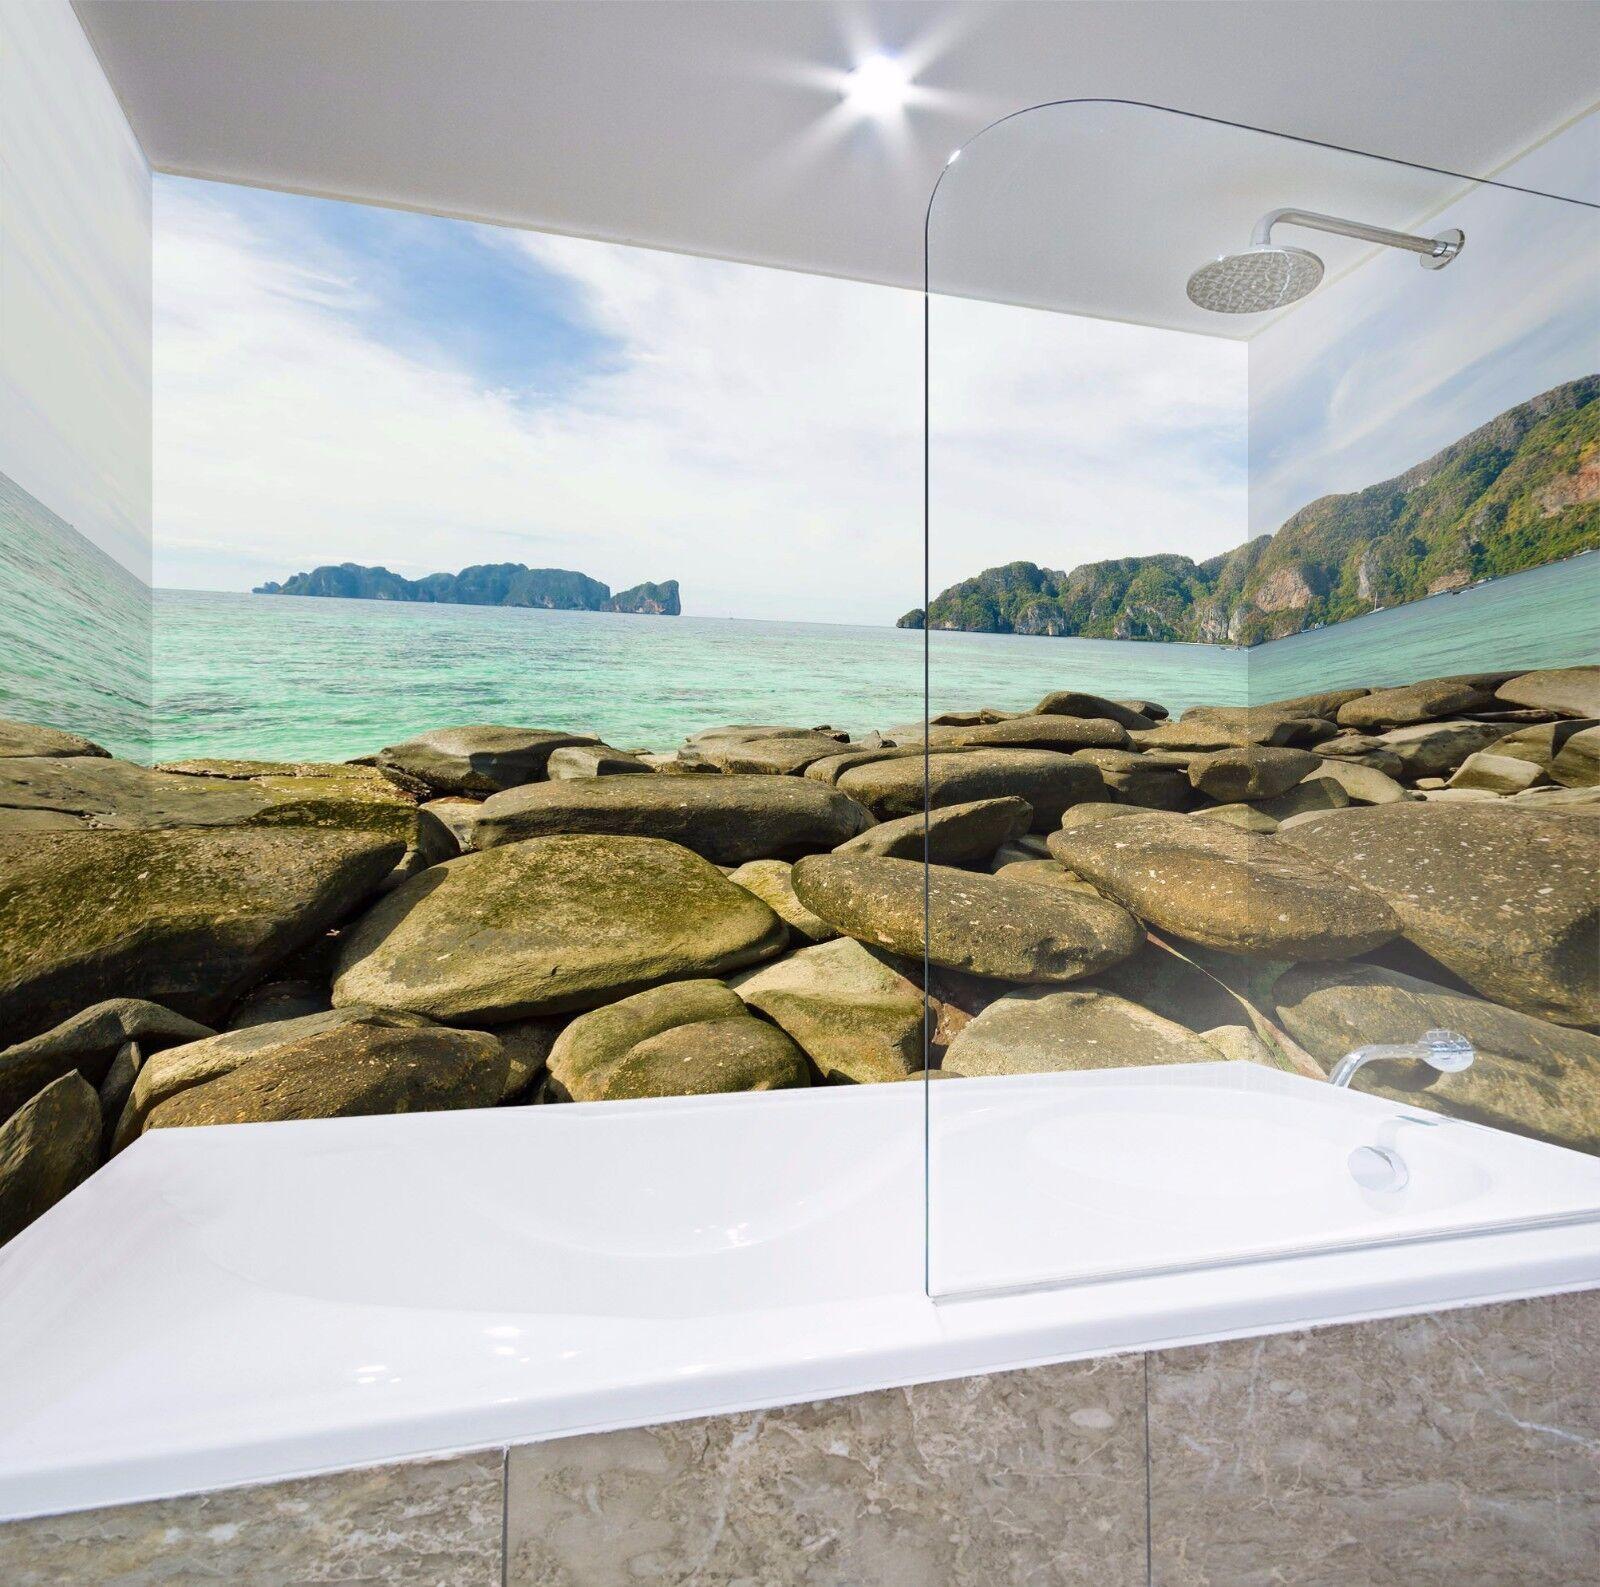 3D Roche 7013  WallPaper Bathroom Print Decal Wall Deco AJ WALLPAPER AU